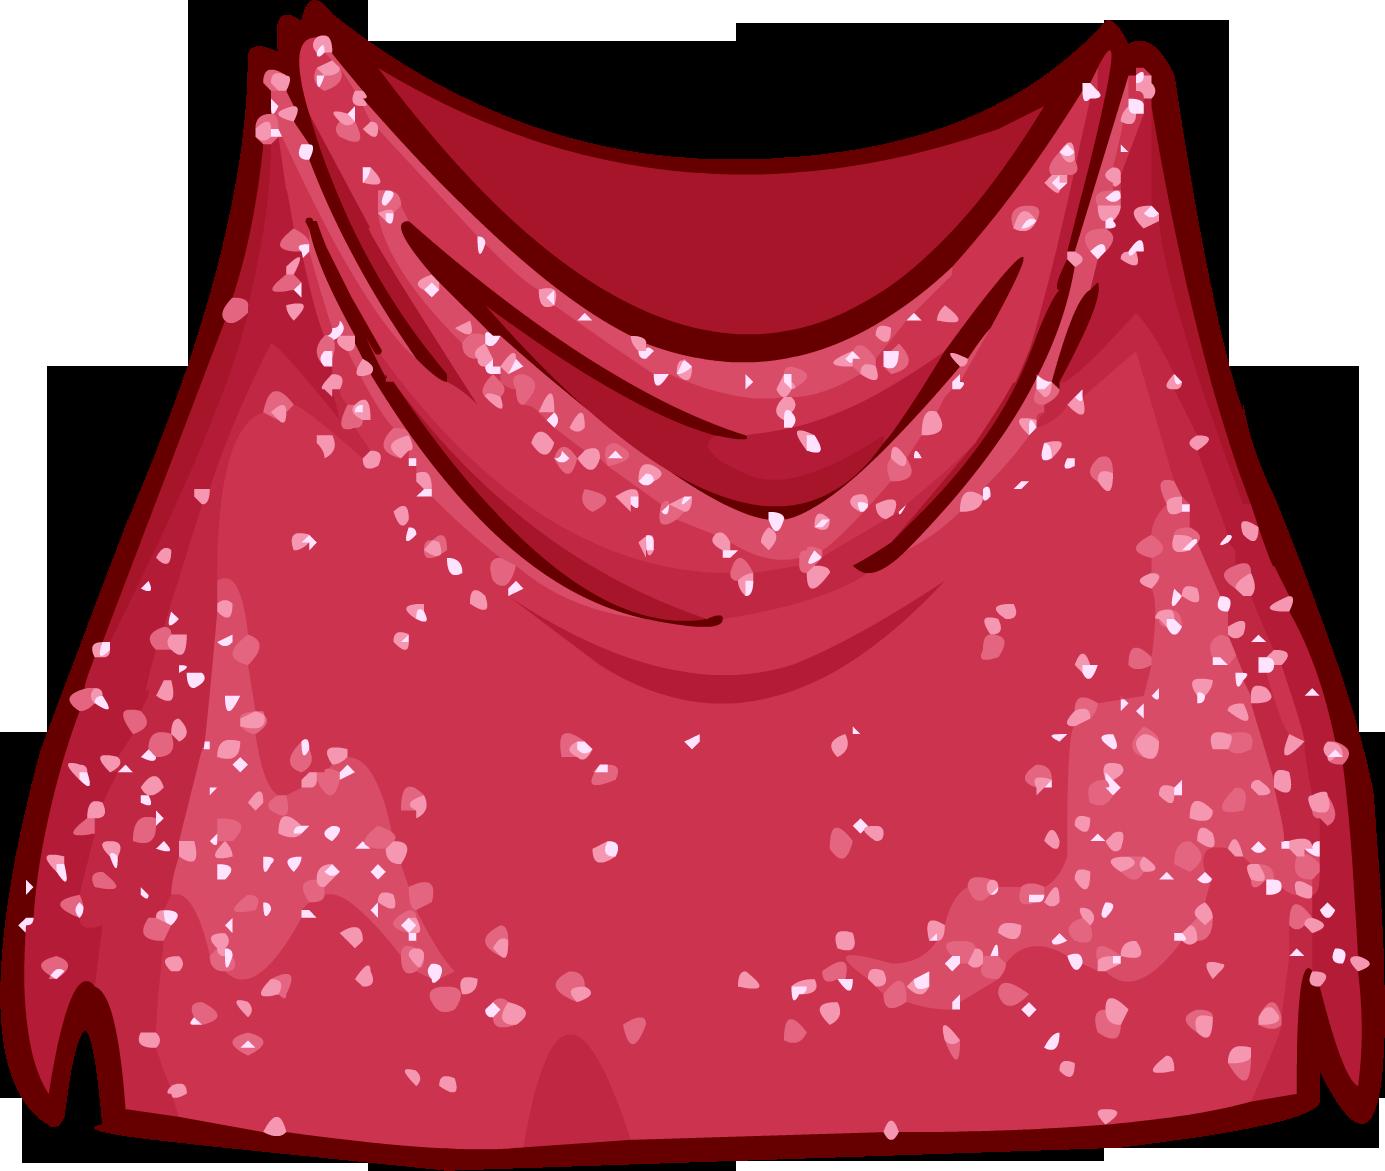 Dazzle Dress | Club Penguin Online Wiki | FANDOM powered by